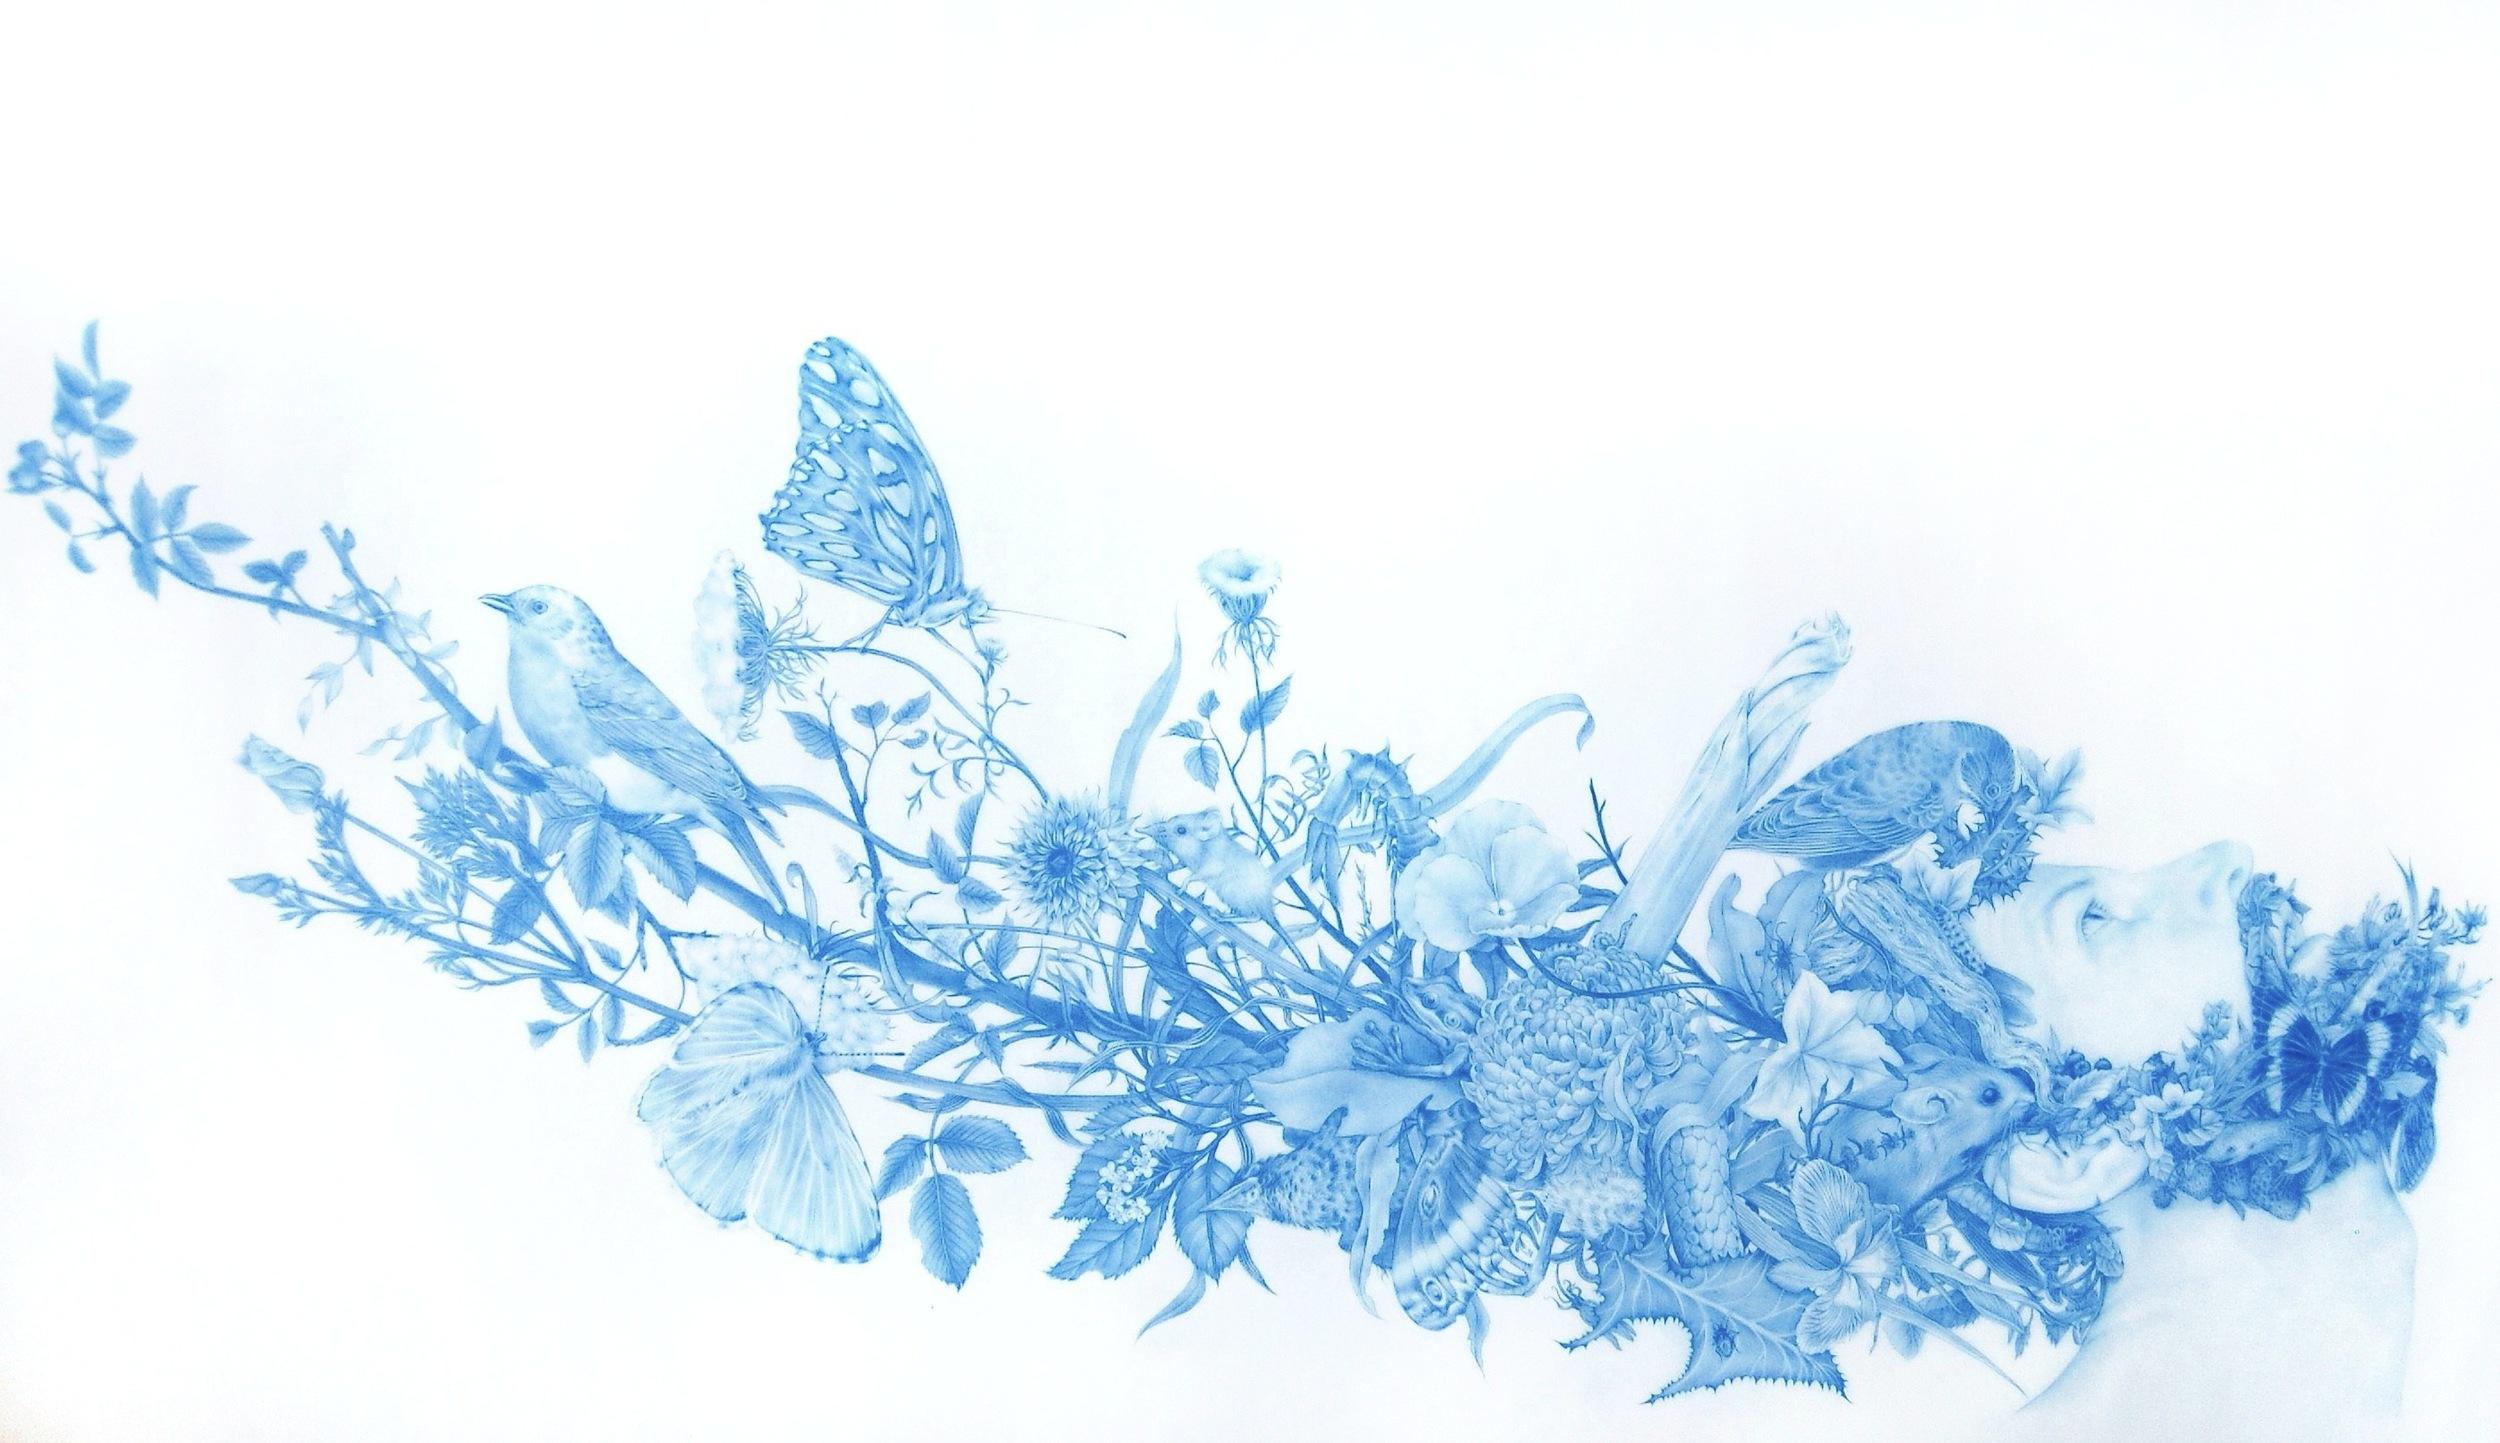 ZACHARI LOGAN, Wild Man 4, 2015, blue pencil on mylar, 21 x 35 inches